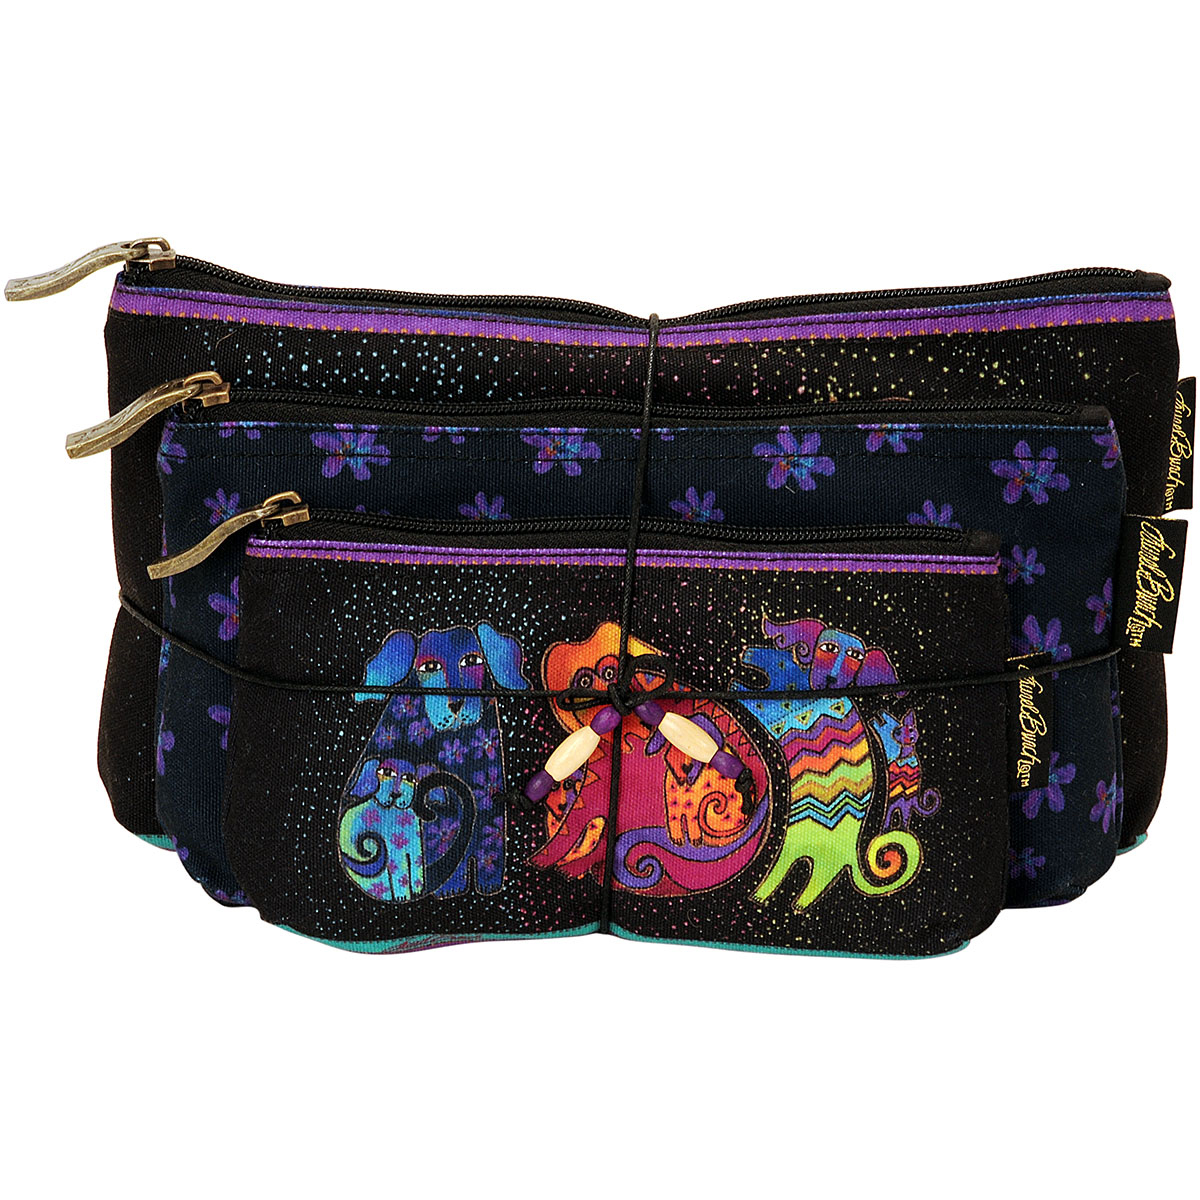 Laurel Burch Cosmetic Bags 3/Pkg-Dogs & Doggies - image 1 of 1